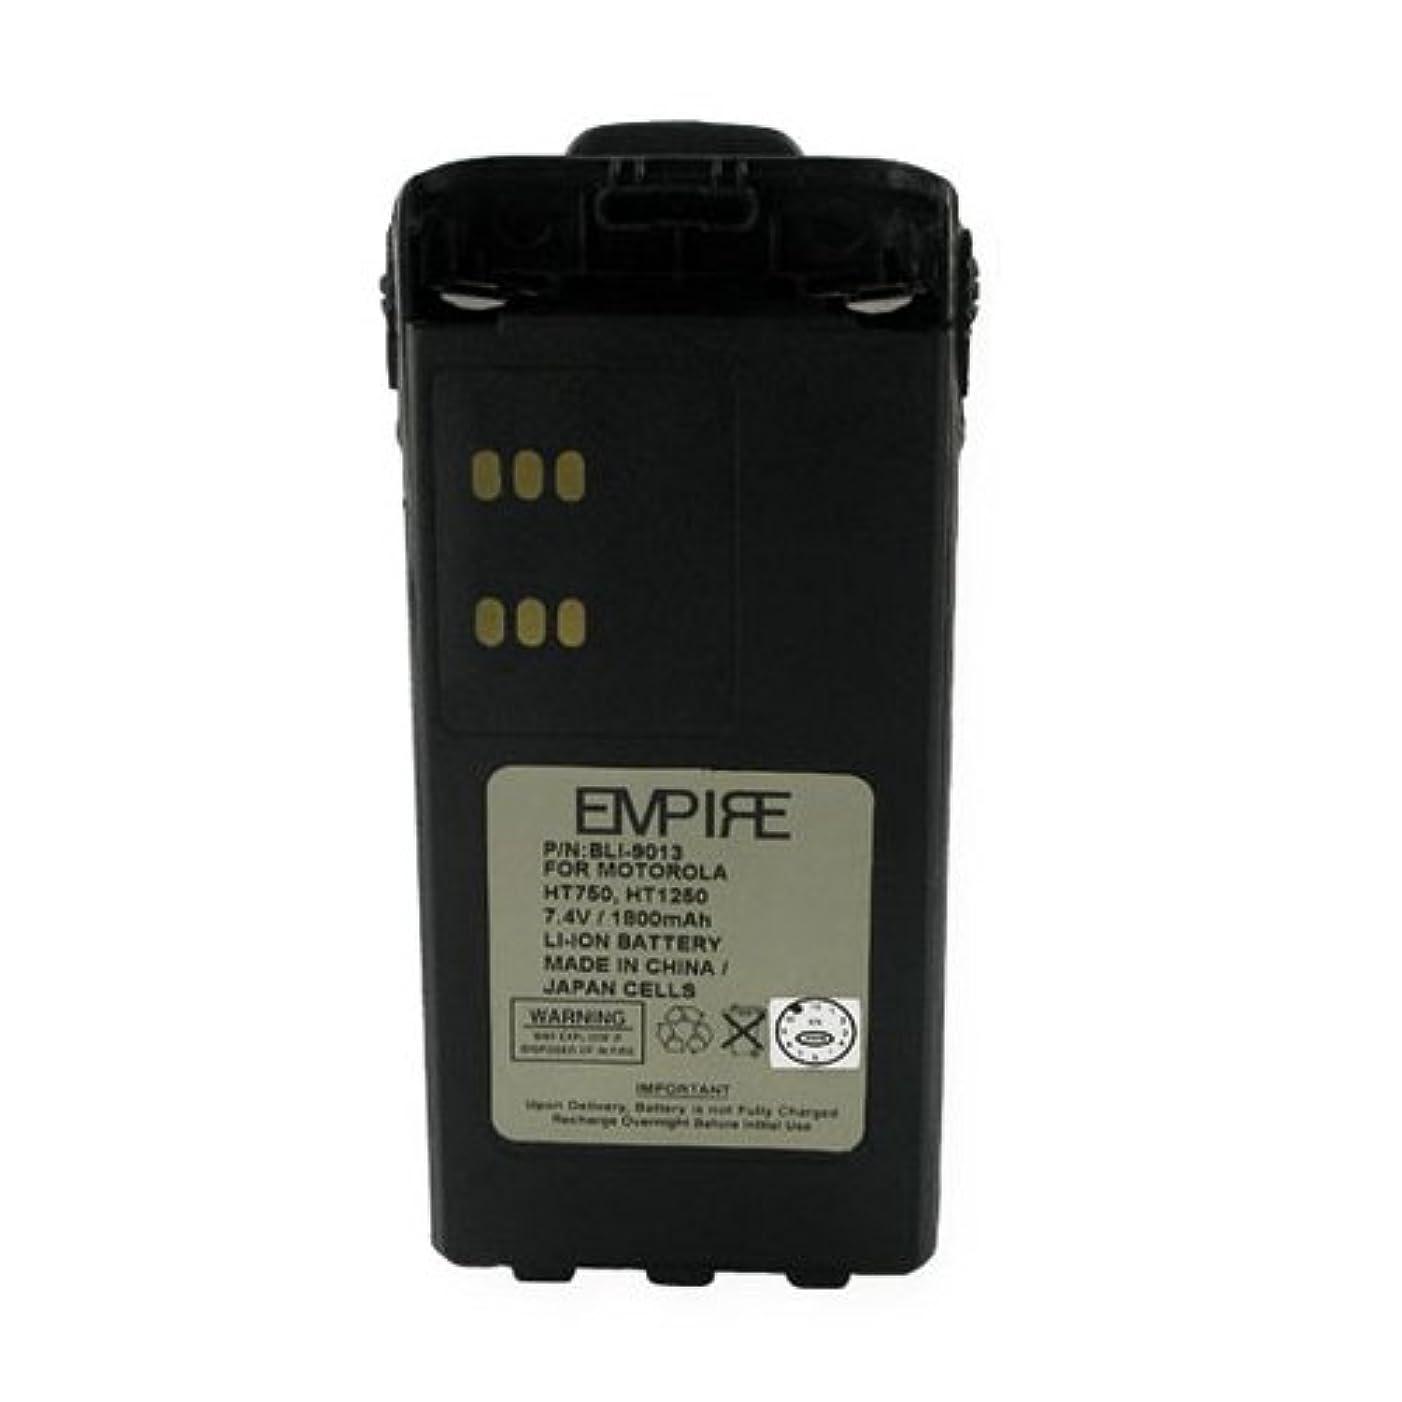 Motorola GP640 2-Way Radio Battery (Li-Ion 7.2V 1800mAh) Rechargeable Battery - Replacement for Motorola HNN9013 Battery